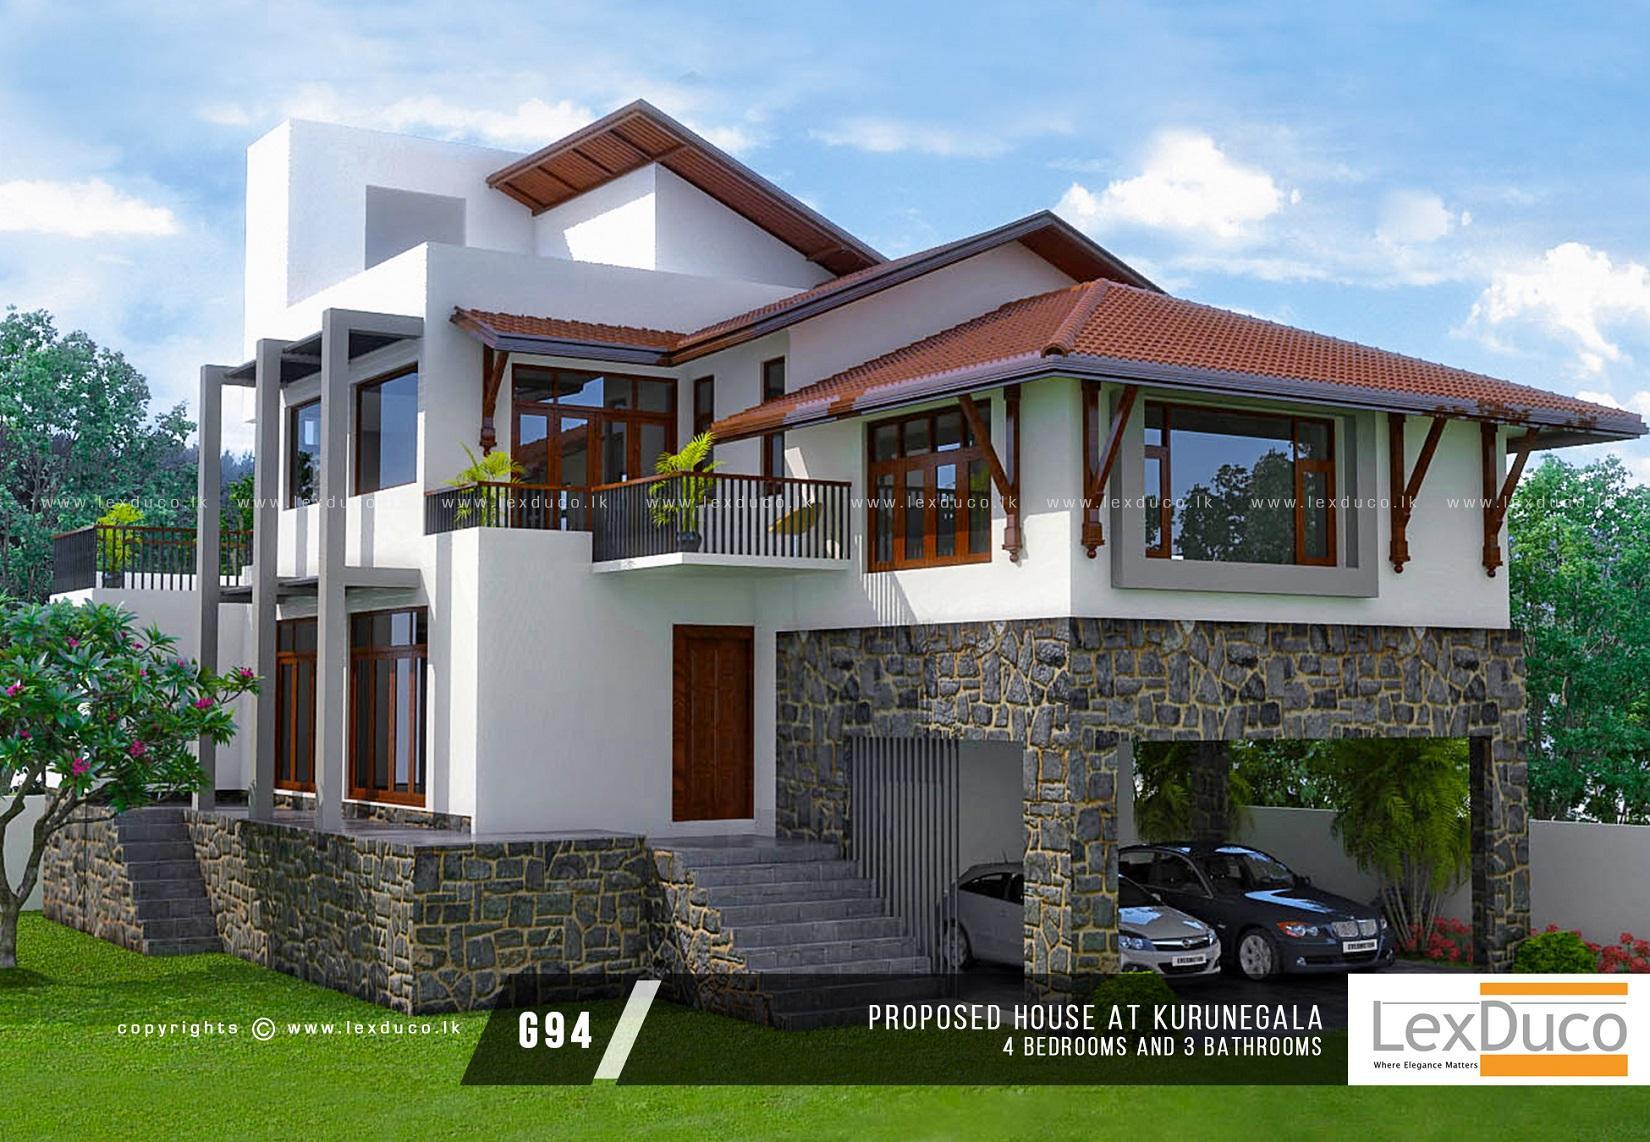 #1 House Builders in Sri Lanka | #1 in Home Construction ...